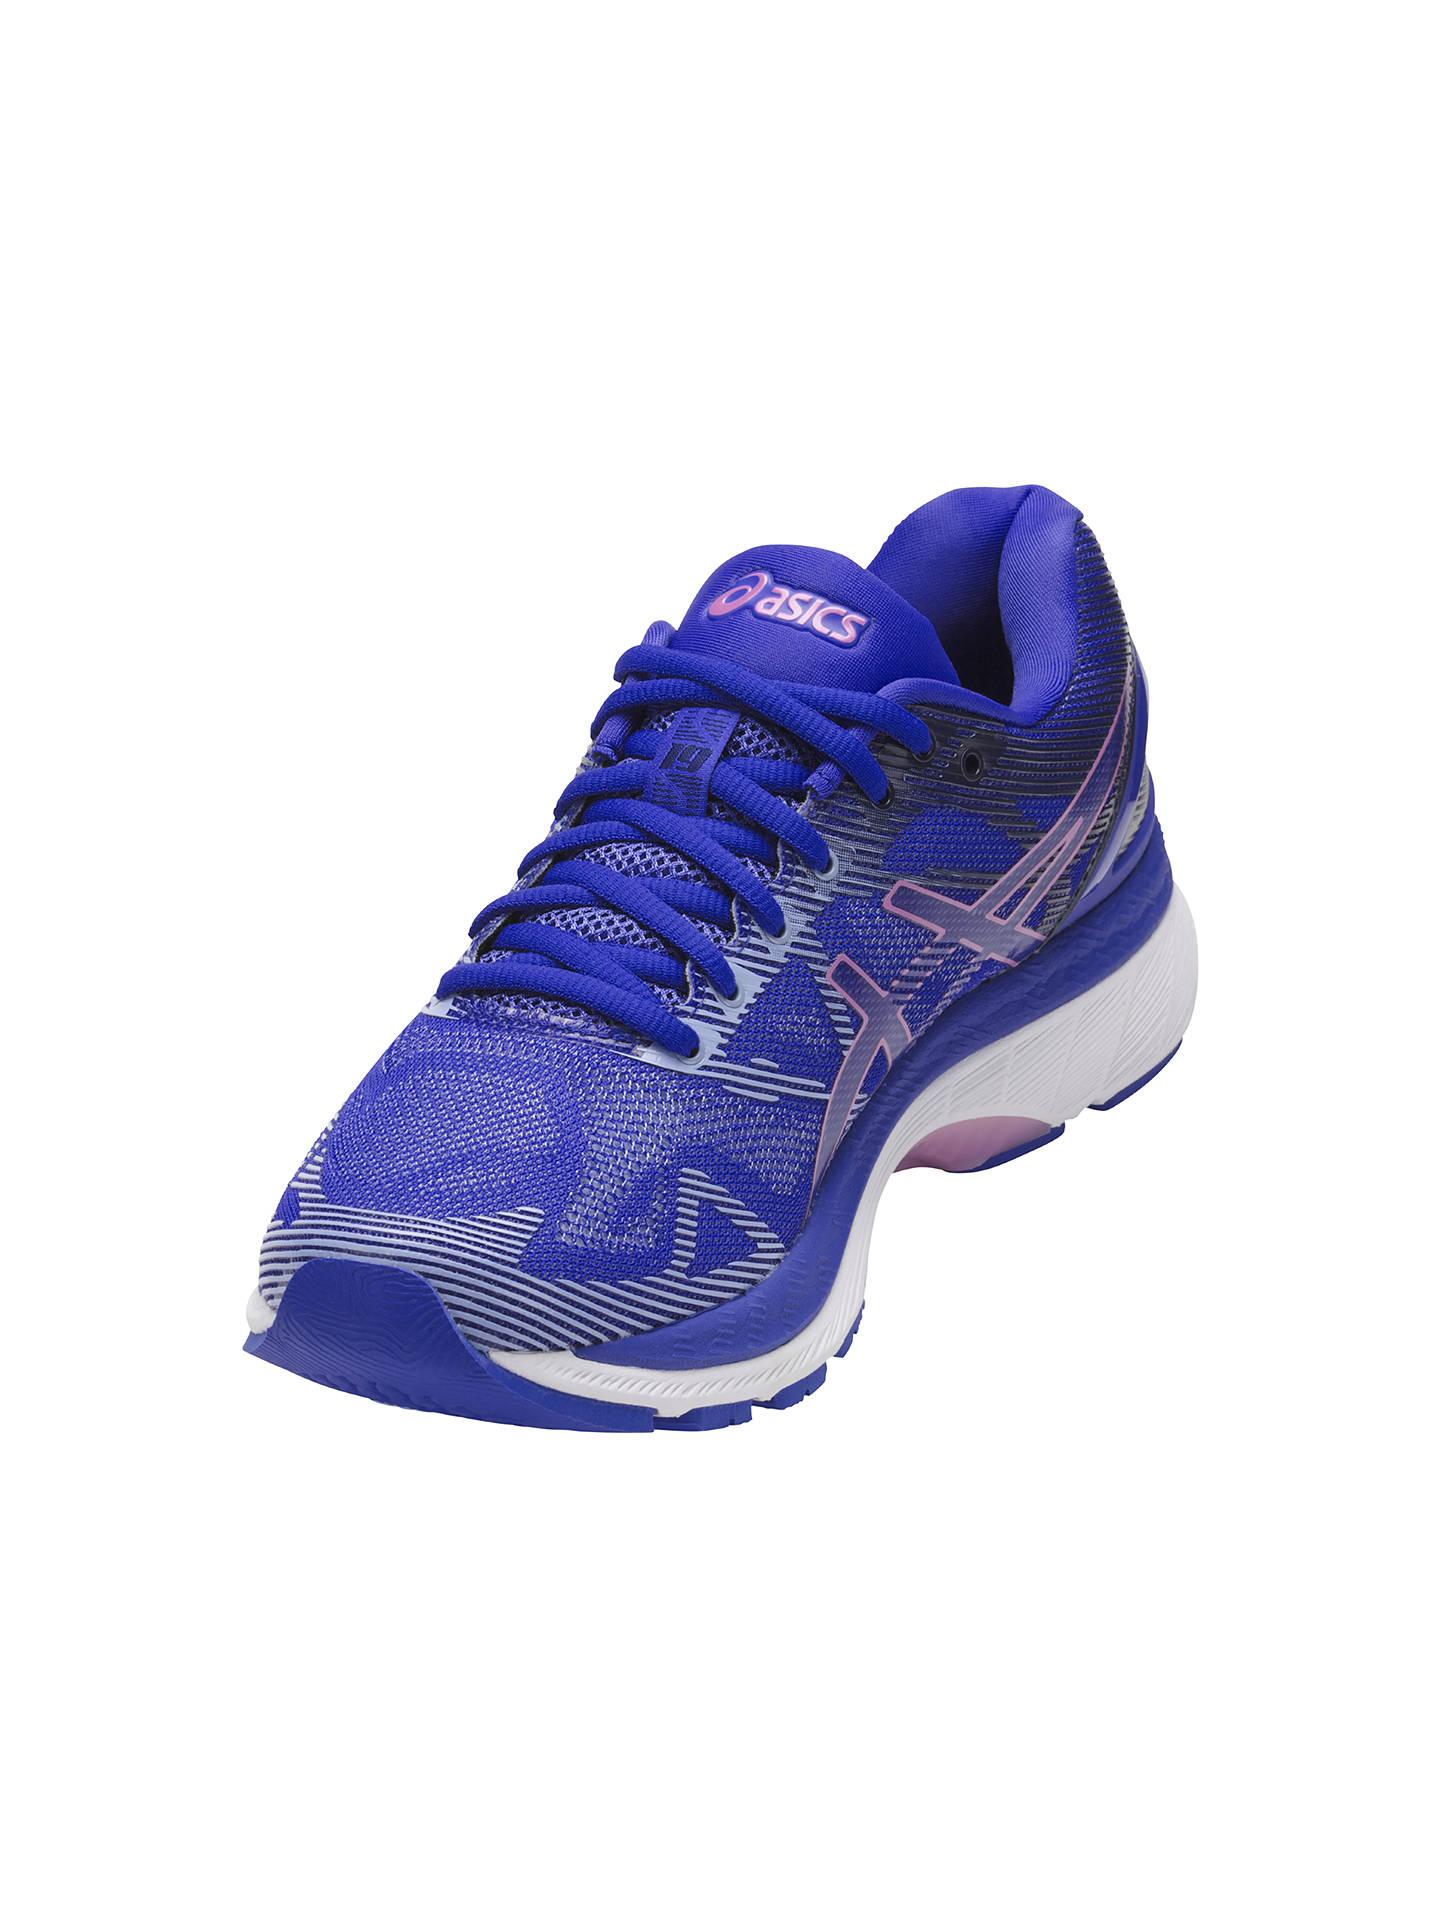 cozy fresh 90894 0320c Asics GEL-NIMBUS 19 Women's Running Shoes, Blue/Purple at ...